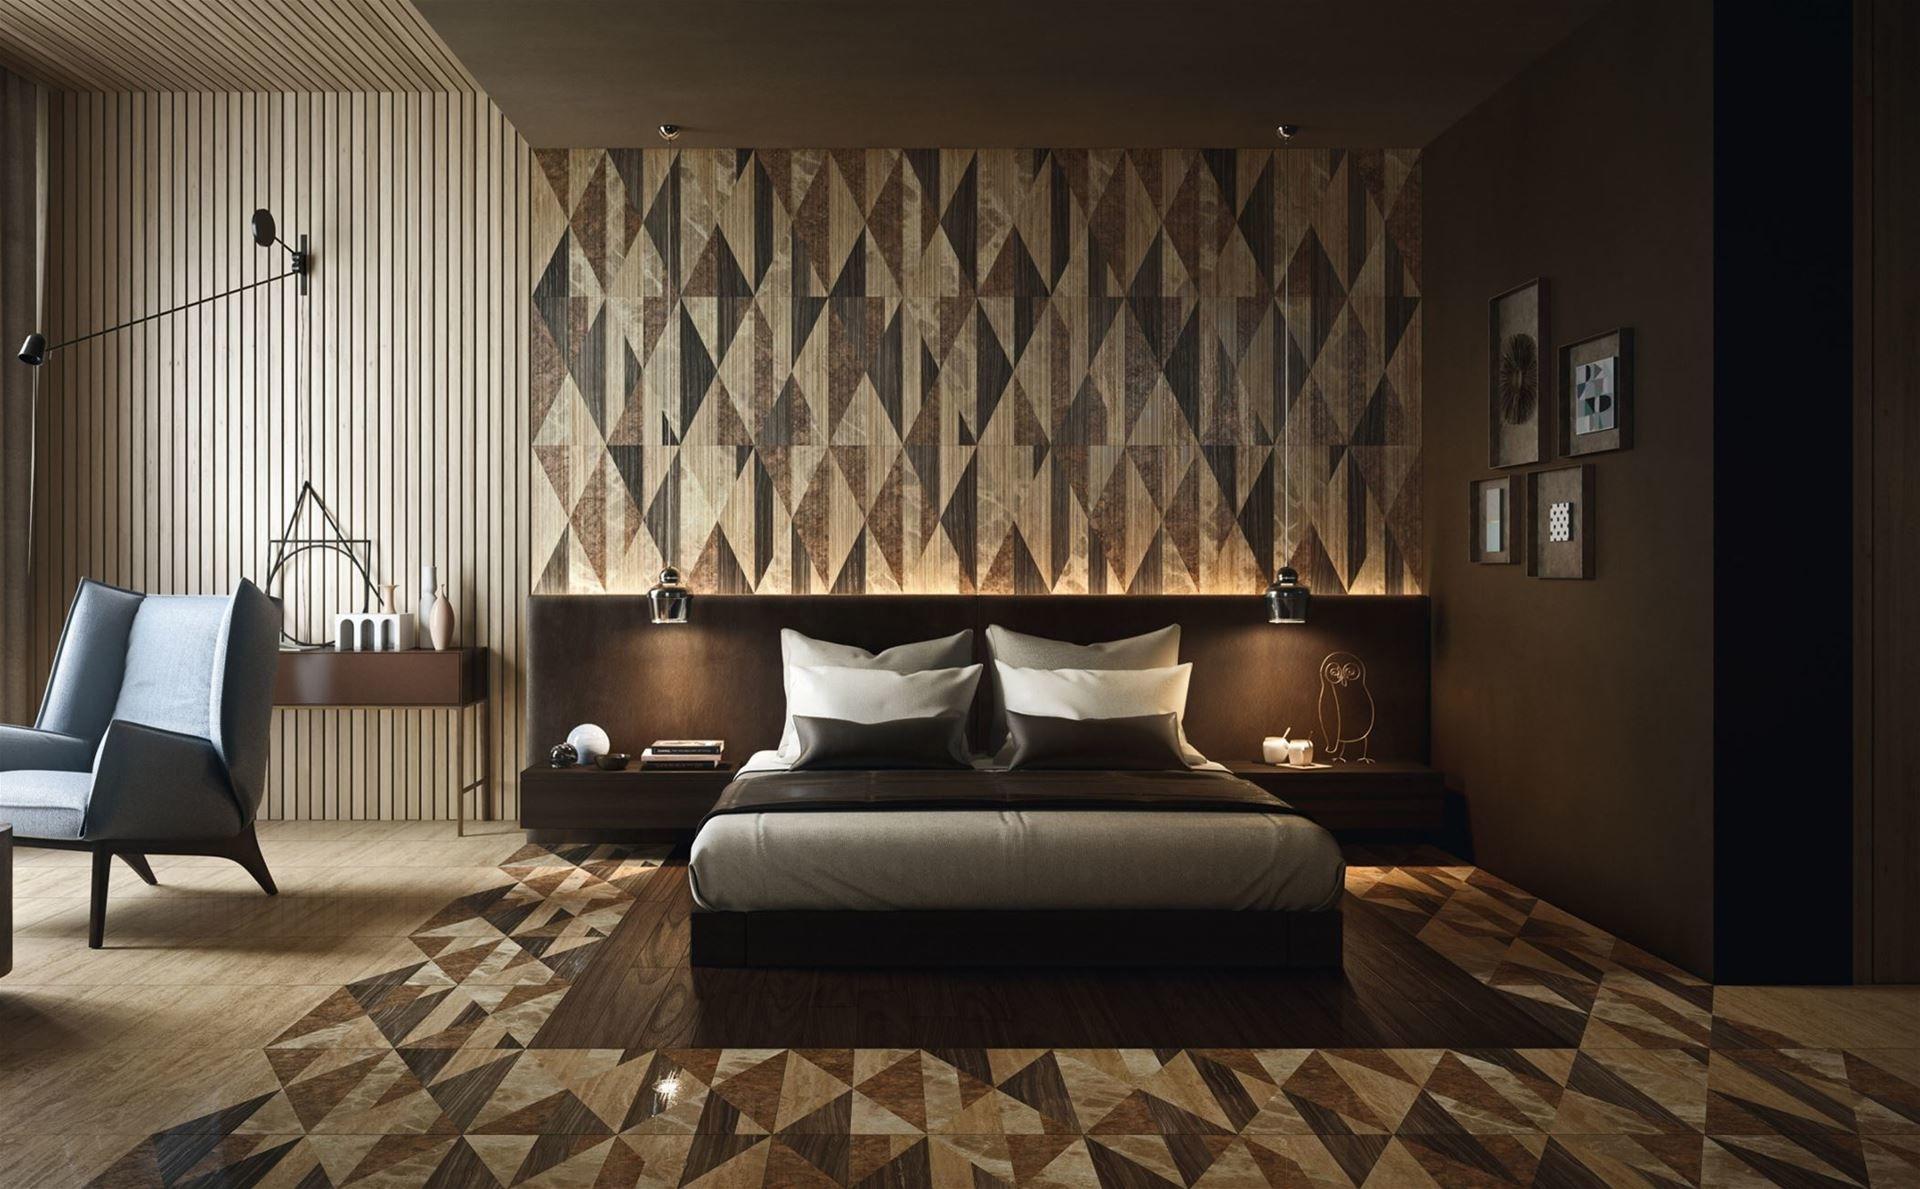 Lithos_Design_Opus_Tangram_luxury_marble_floor_1_sand_pr.jpg